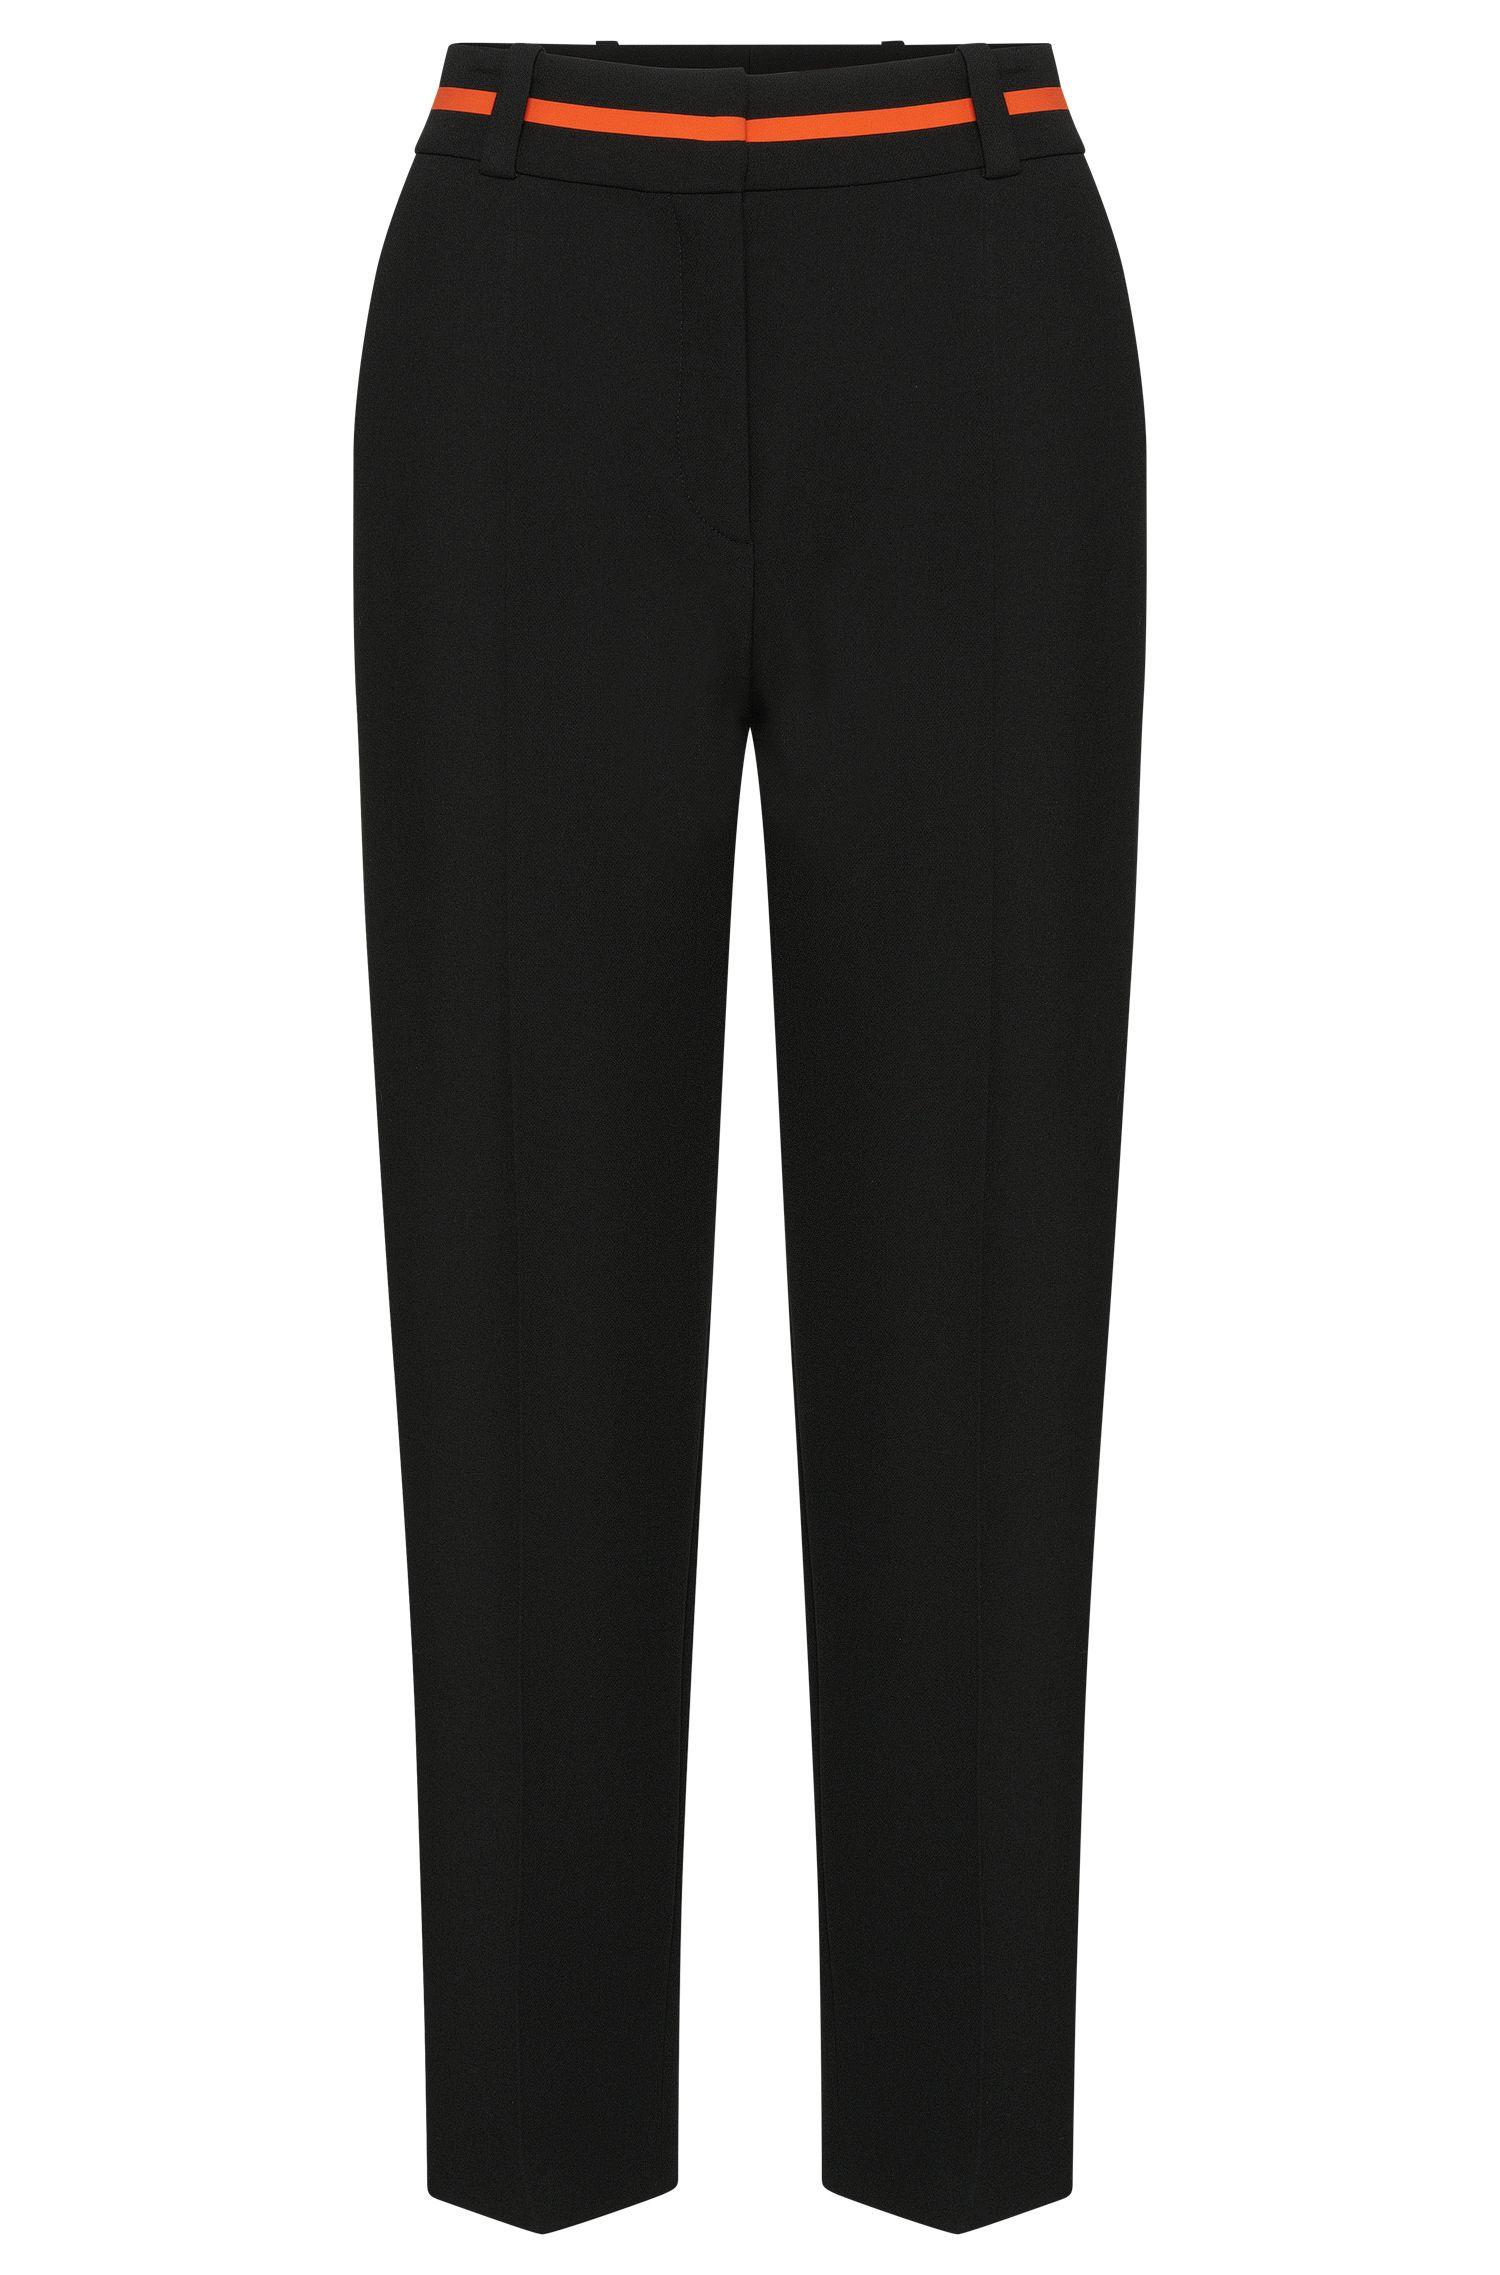 Hose im Culotte-Stil mit Kontrast-Detail am Bund: 'Hulina'